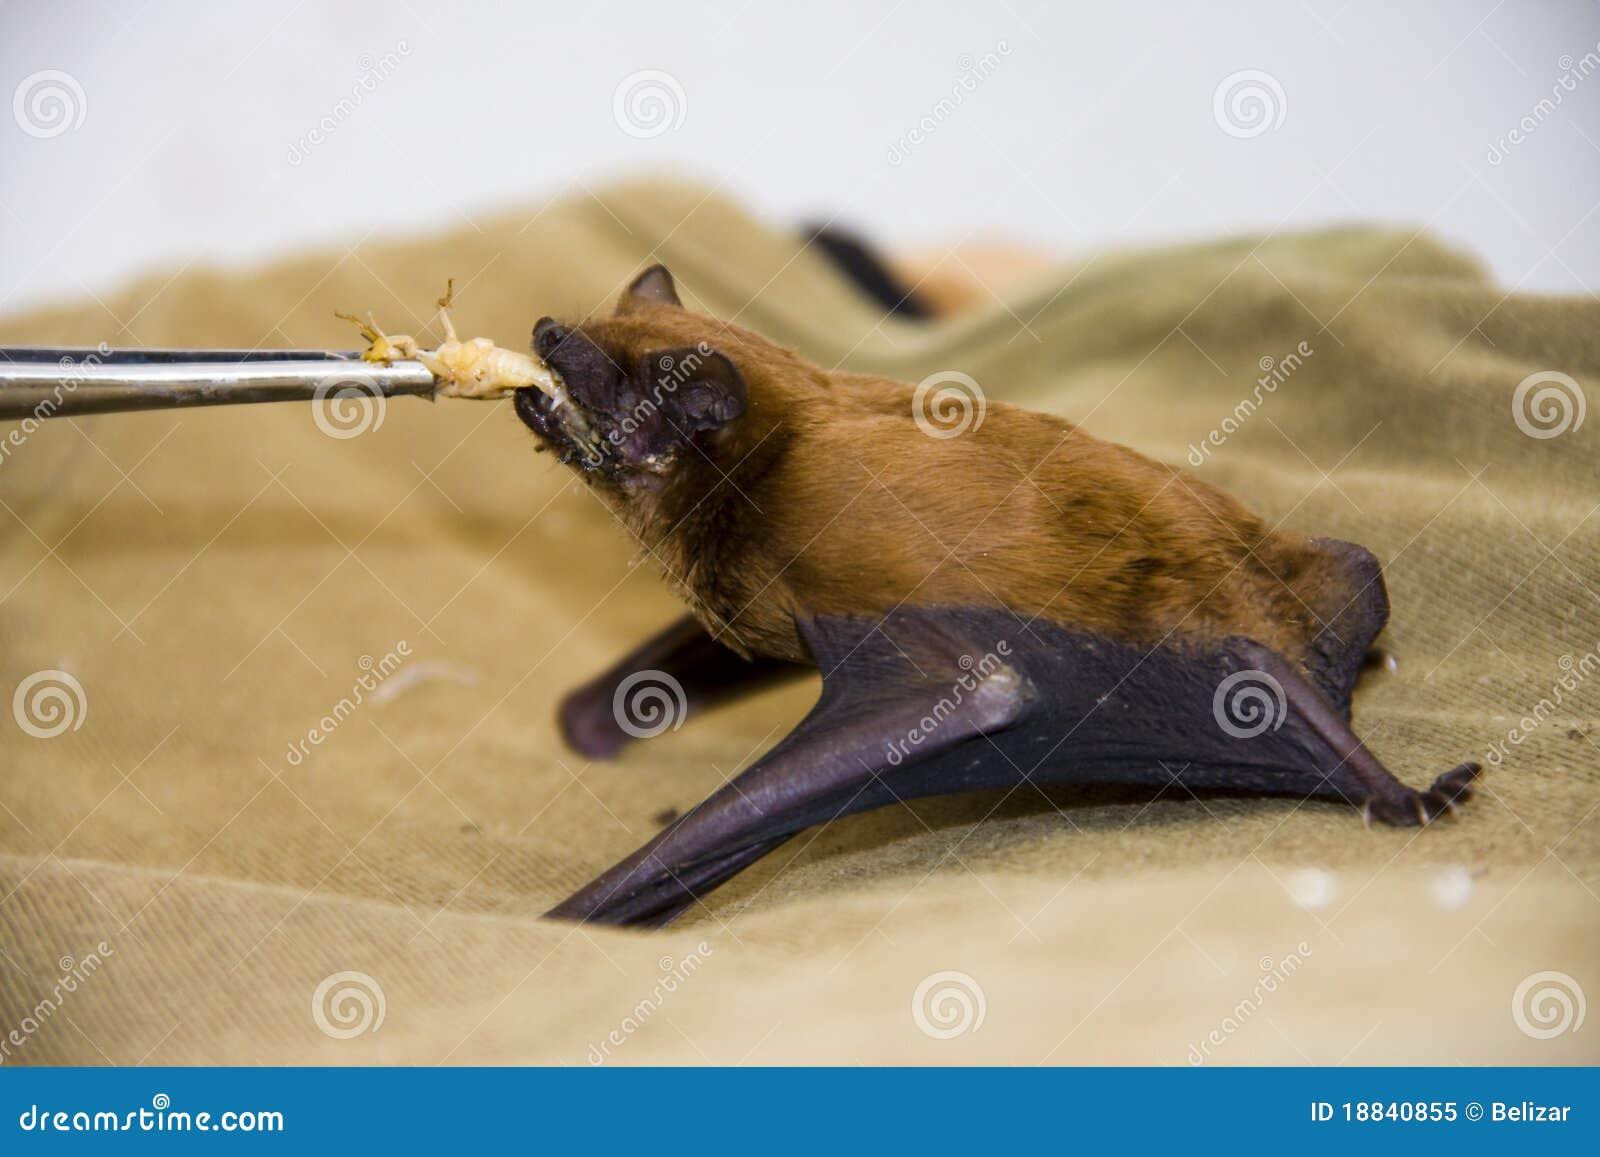 Feeding a common noctule (Nyctalus noctula)